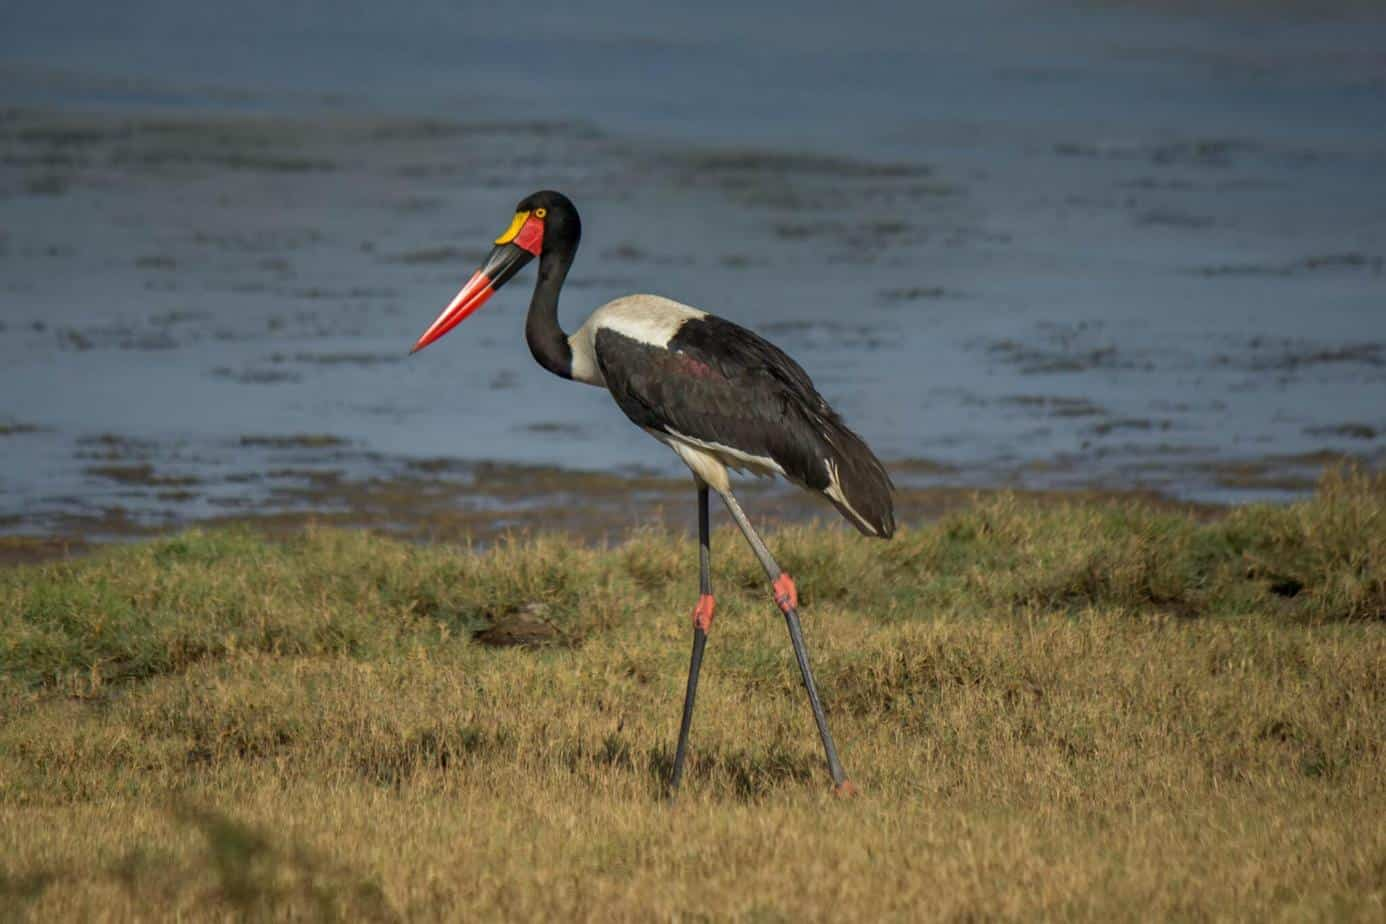 Saddle-billed Stork @ Ndumo Game Reserve. Photo: Håvard Rosenlund